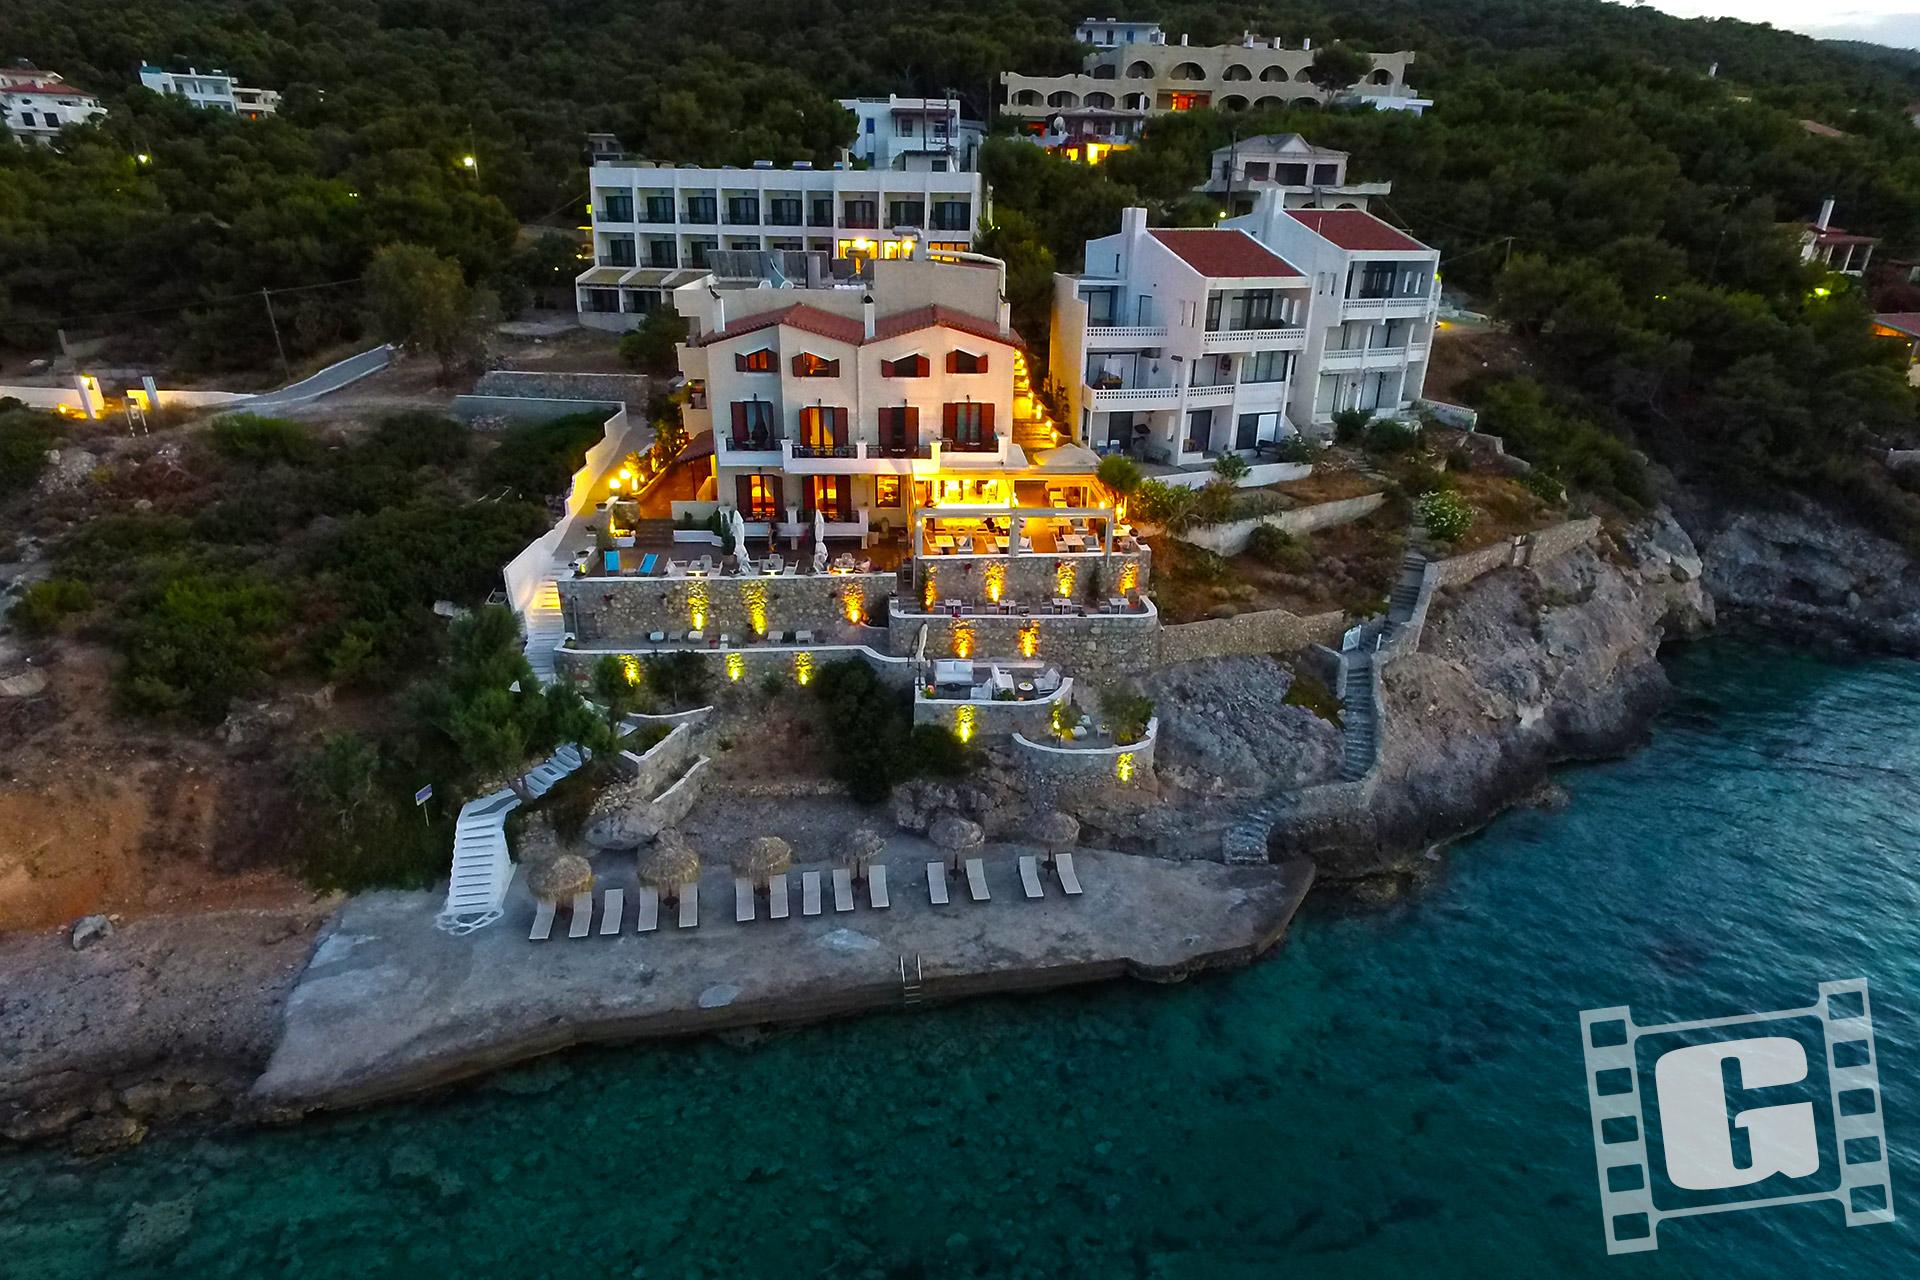 Hotel Kekrifalia, Agistri Island, Greece, Κεκρυφάλια, Αγκίστρι, Photos, Video by Giatrakos